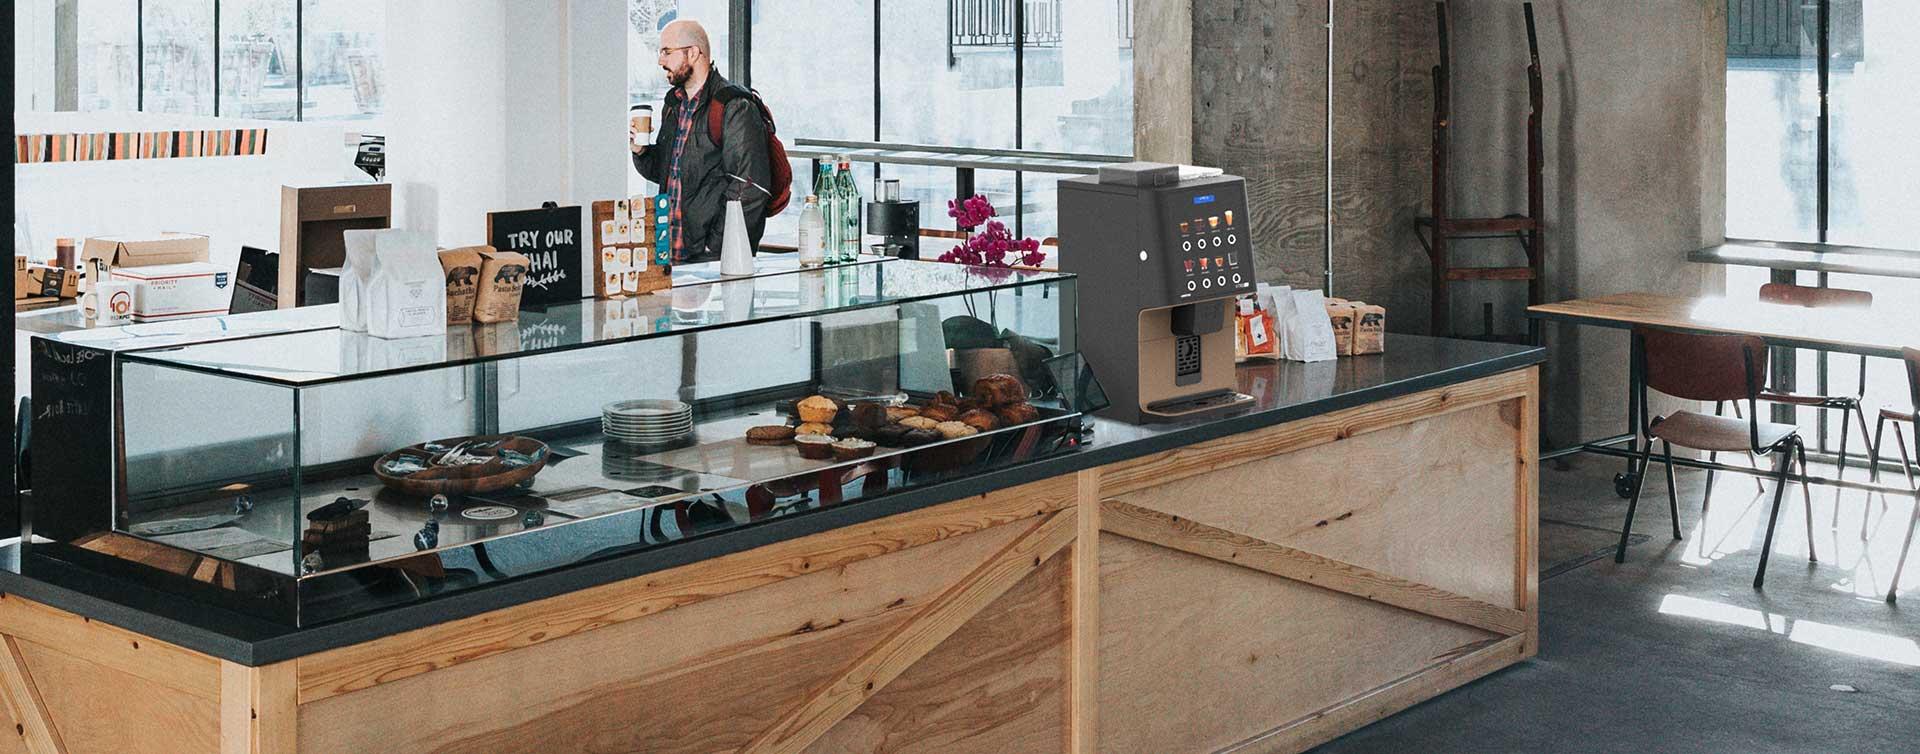 Grupo Azkoyen lanzará al mercado estadounidense la máquina de café Vitro S1 durante la feria Coffee Tea & Water